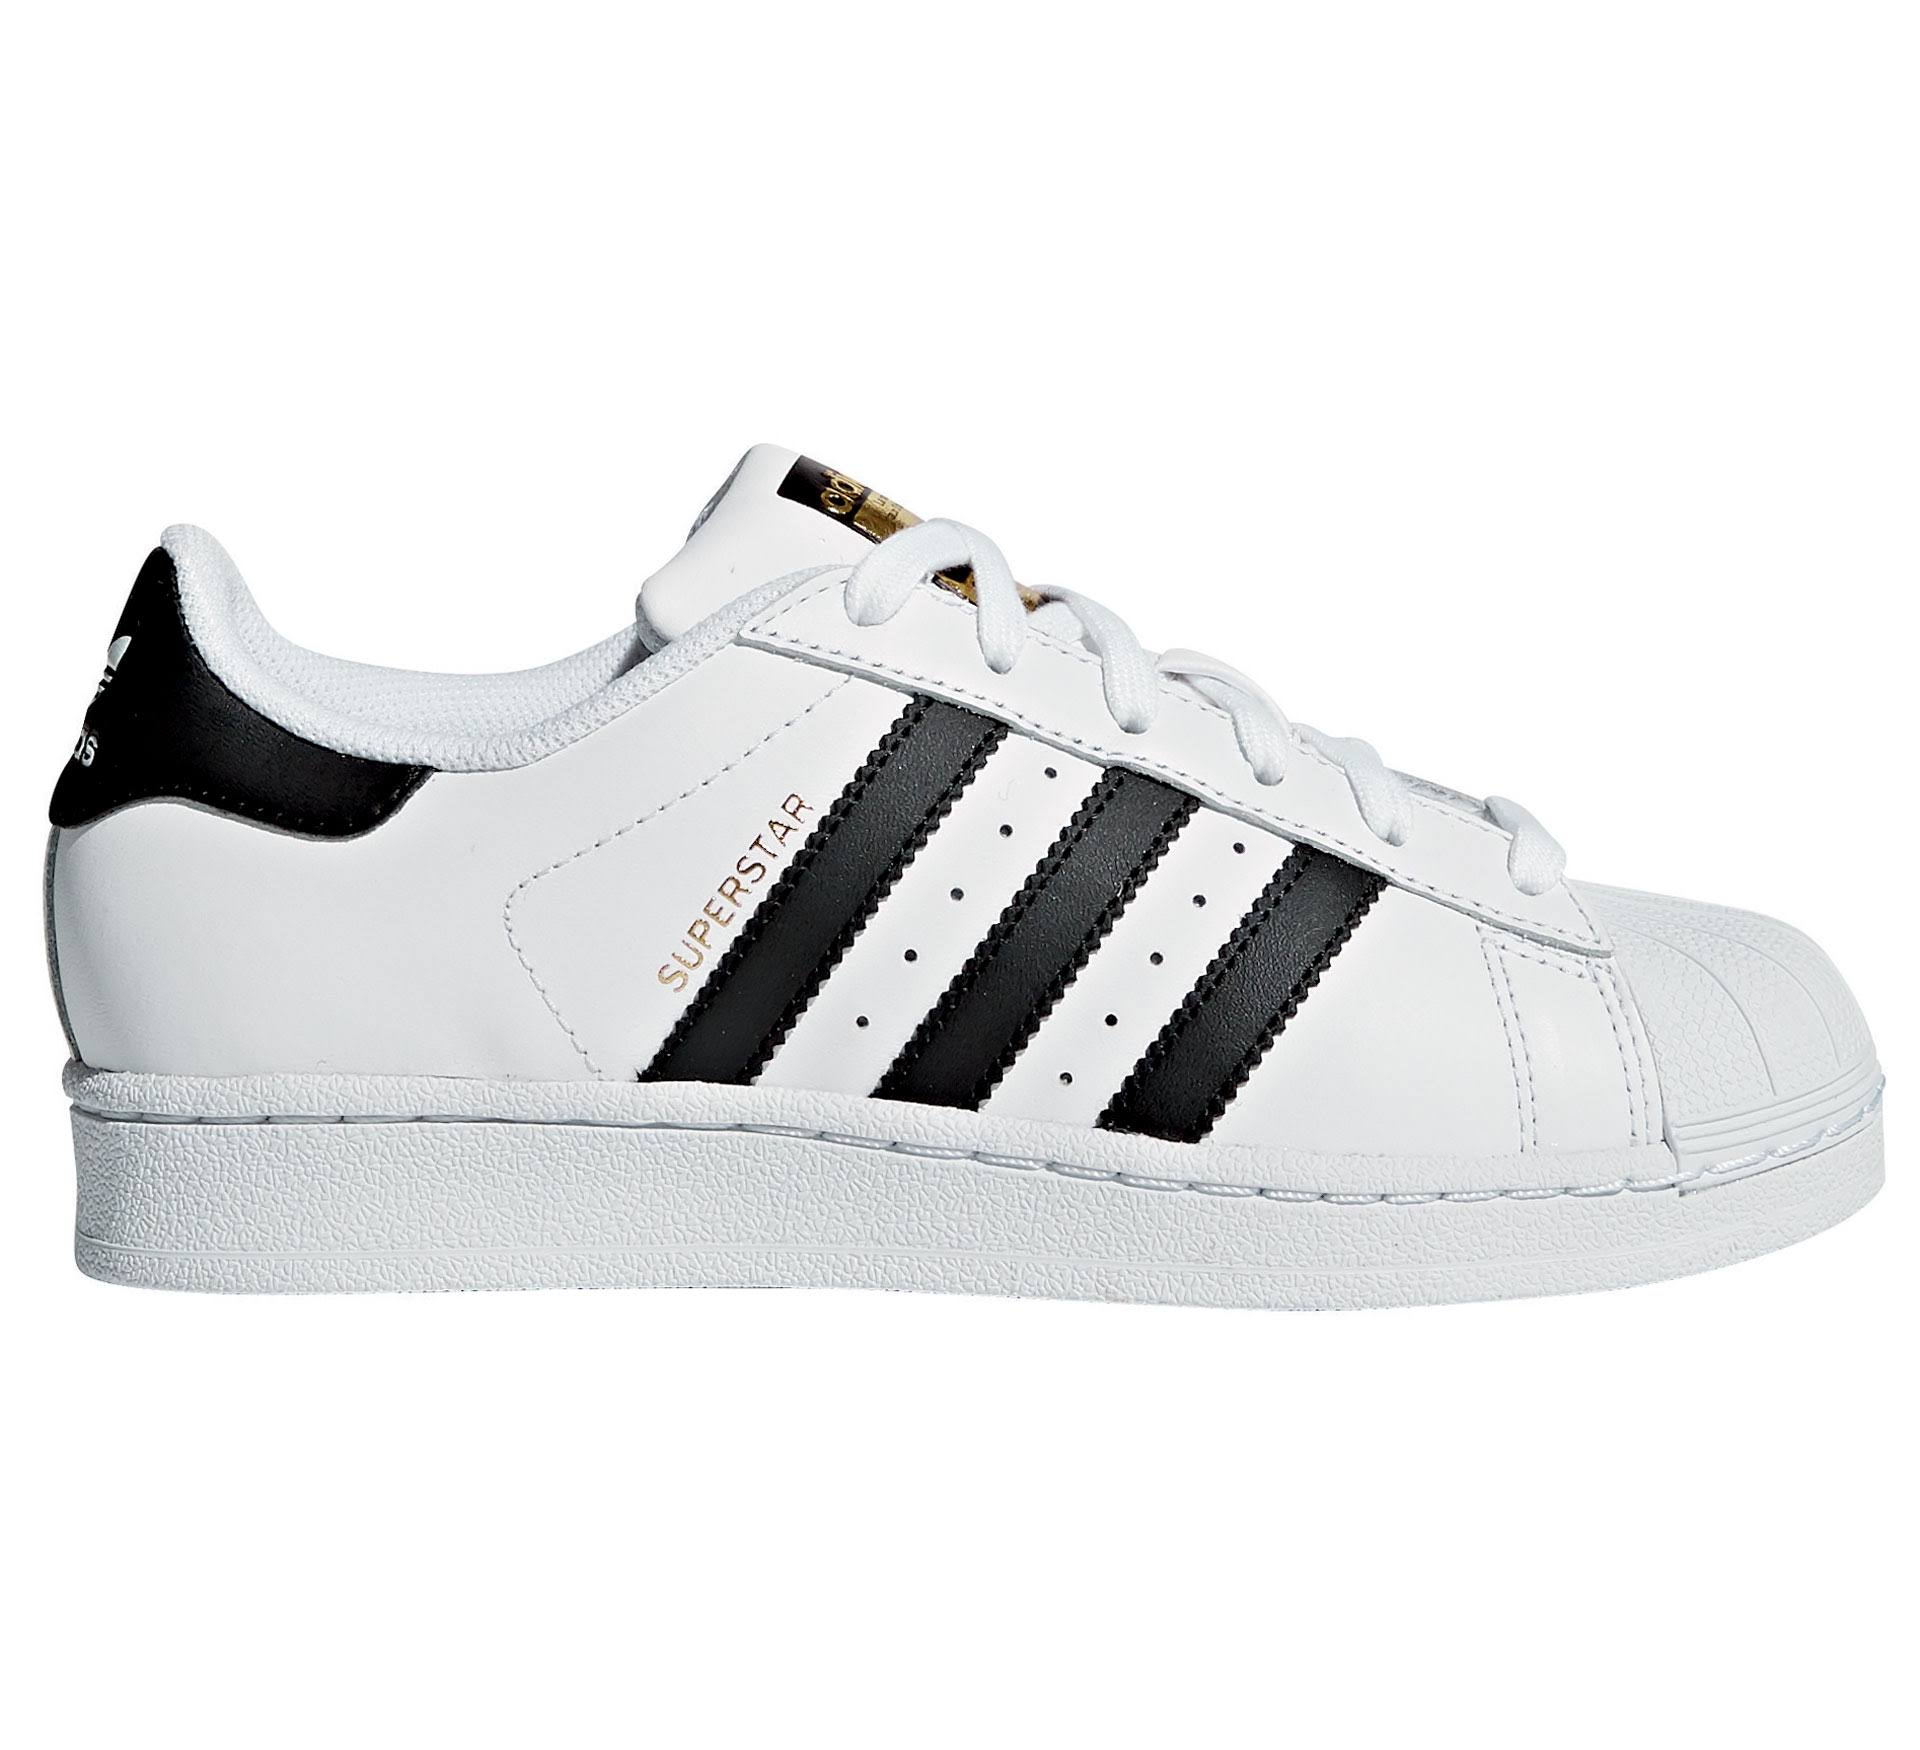 Adidas White Superstar Adidas Superstar Adidas Black White Black UqGSzLpMV